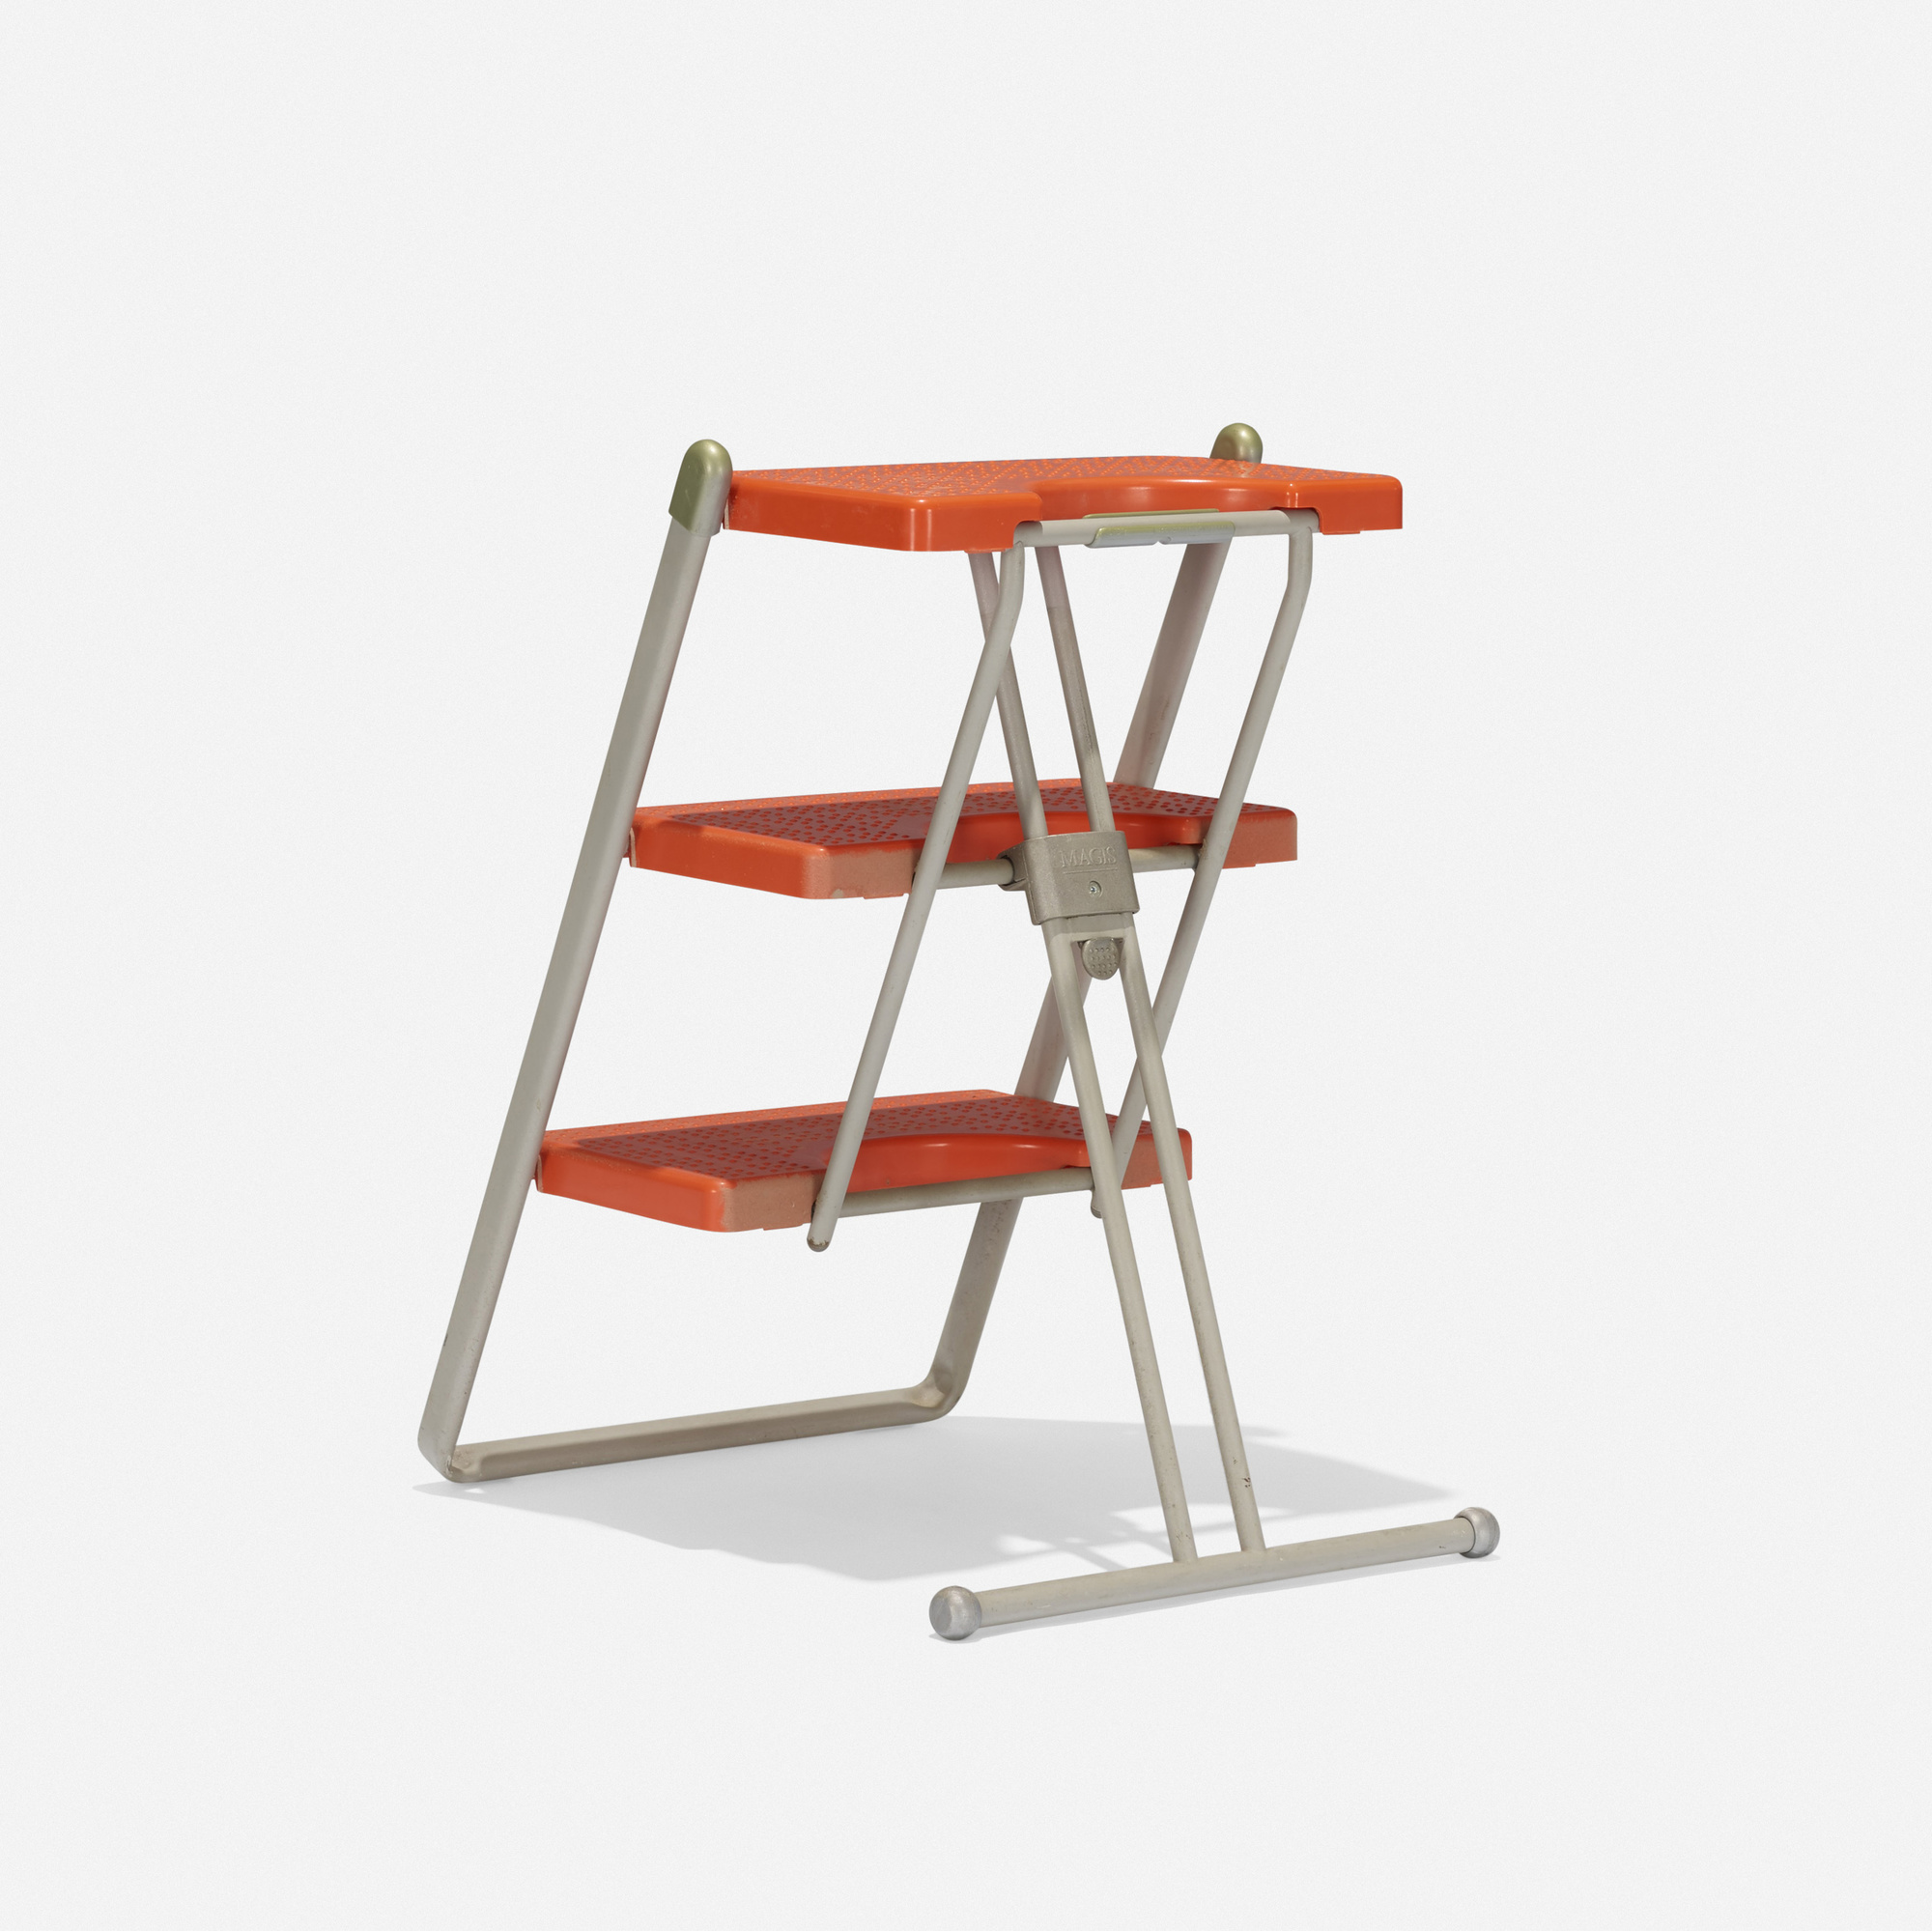 340: Andries and Hiroko Van Ock / Nuovastep folding step-ladder (2 of 3)